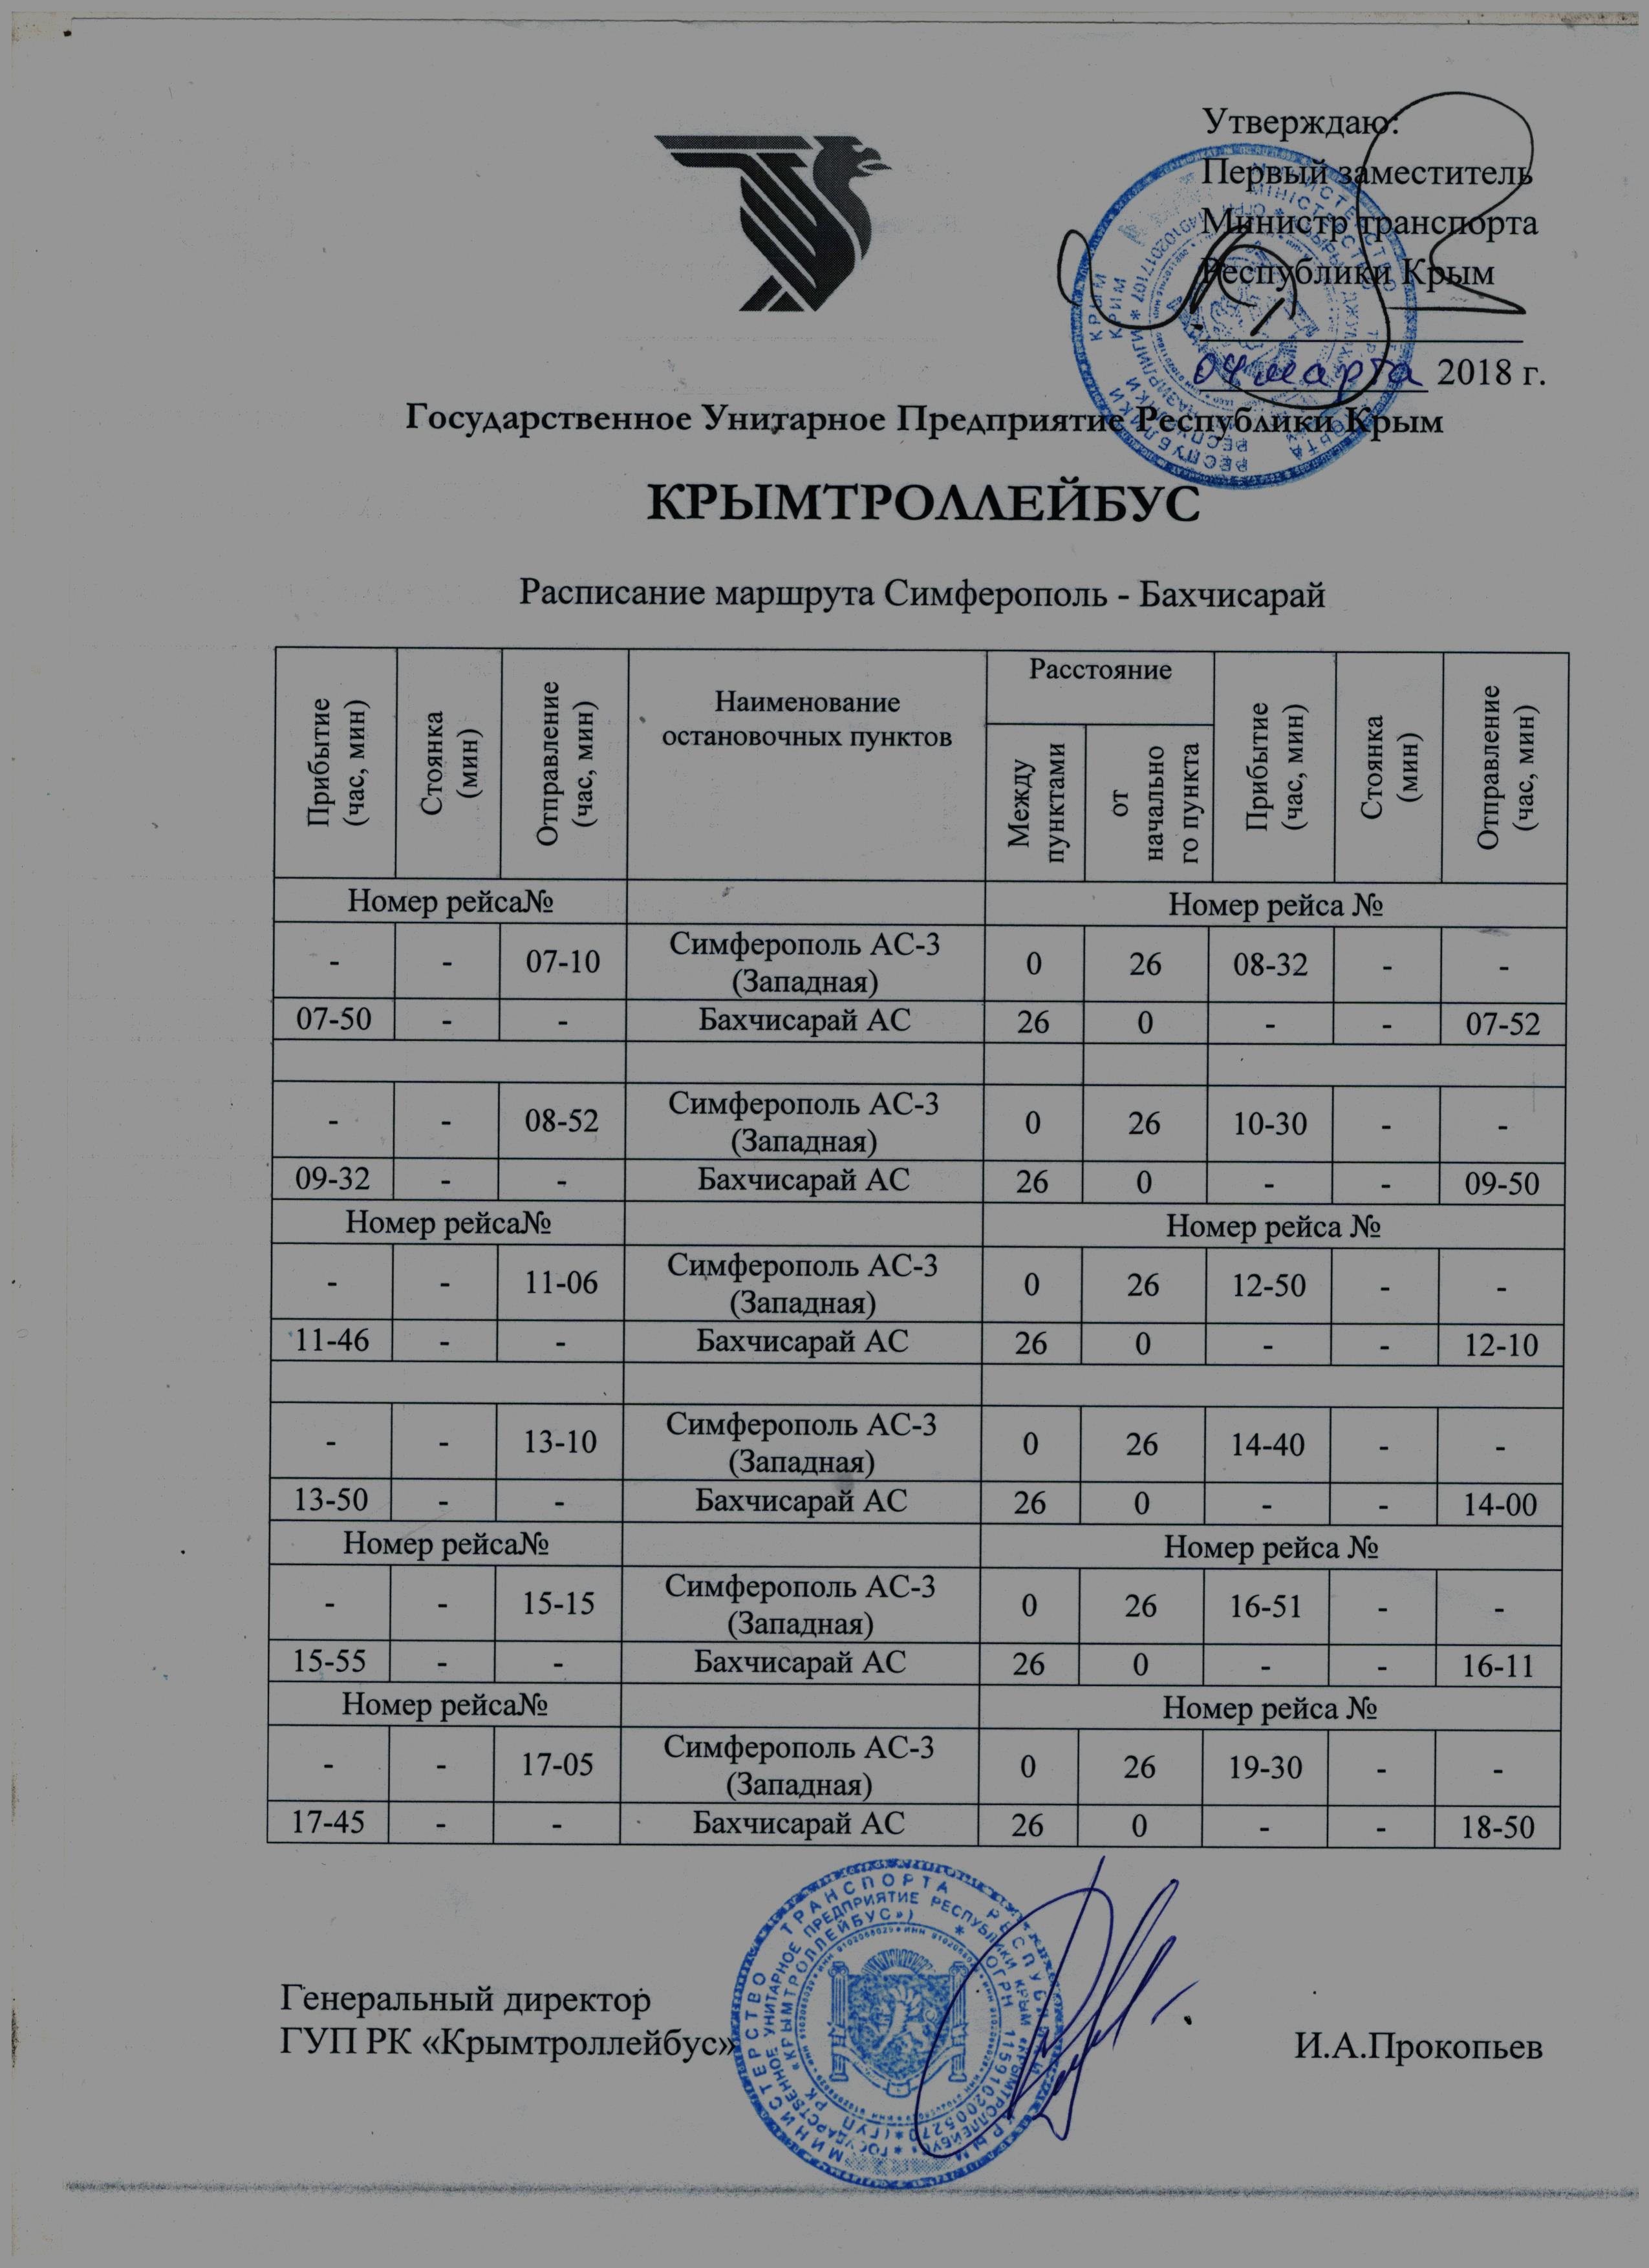 бАХЧИСАРАЙ 7-10